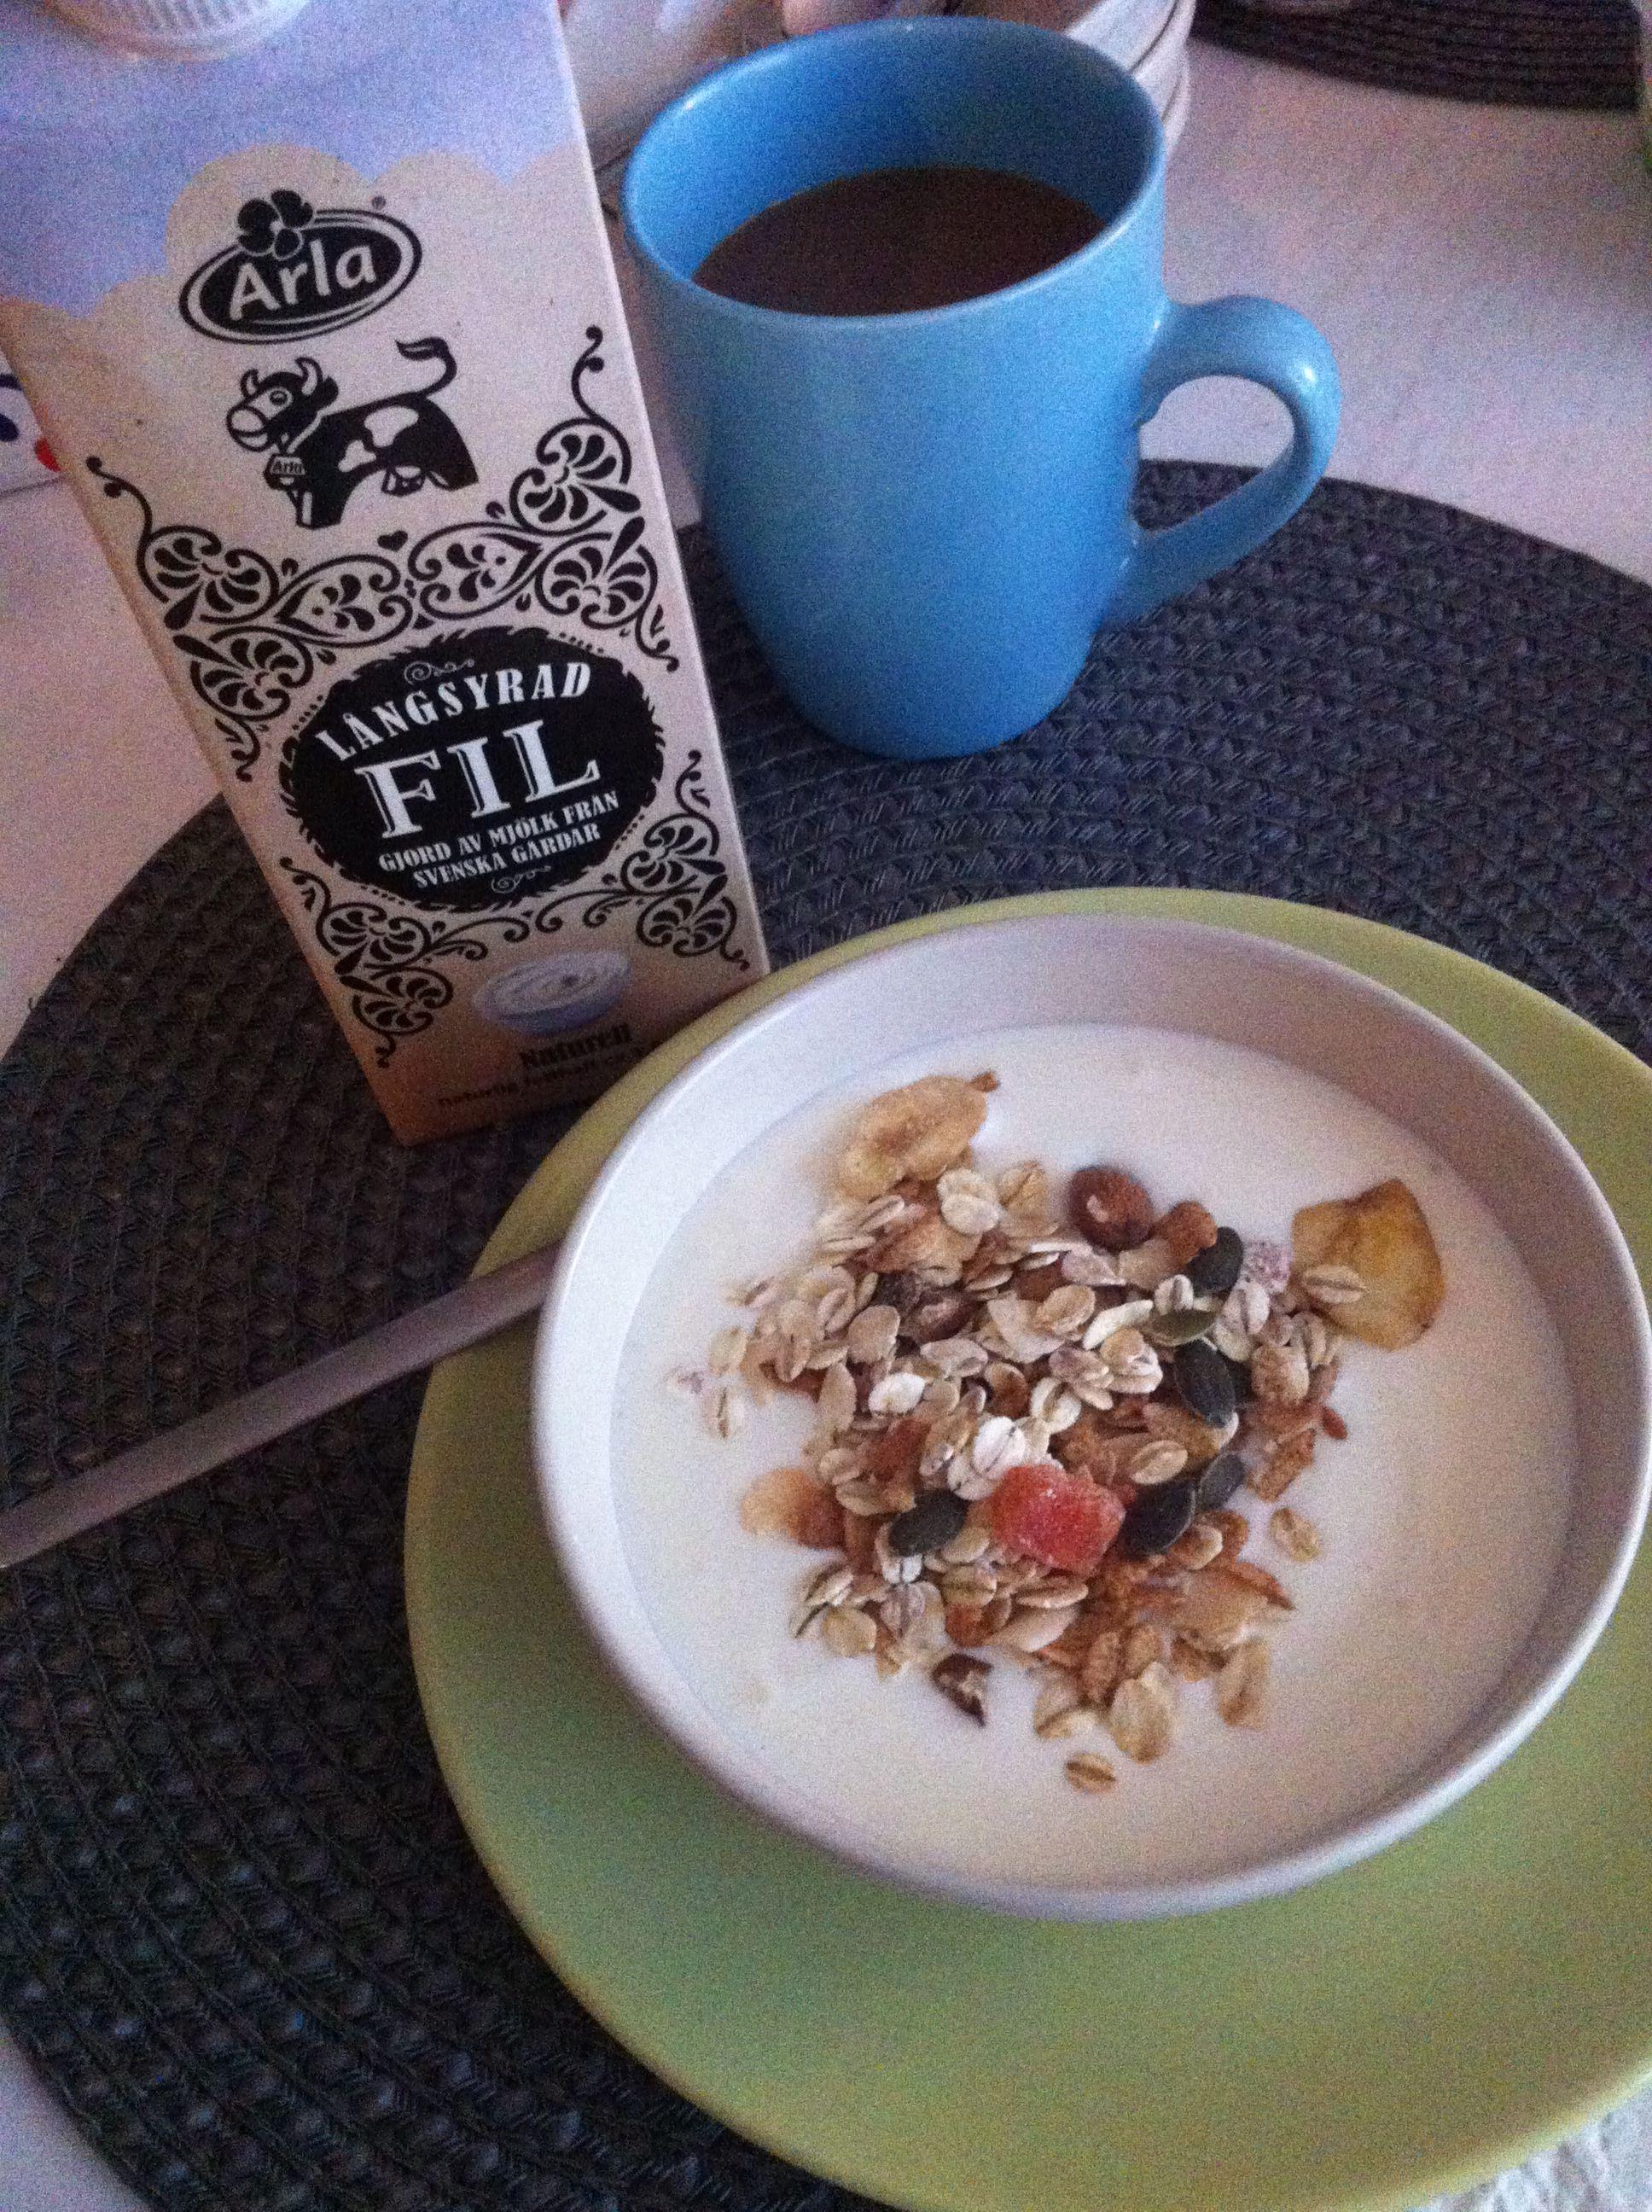 A good party starts with a good breakfast! #smartson #långsyradfil